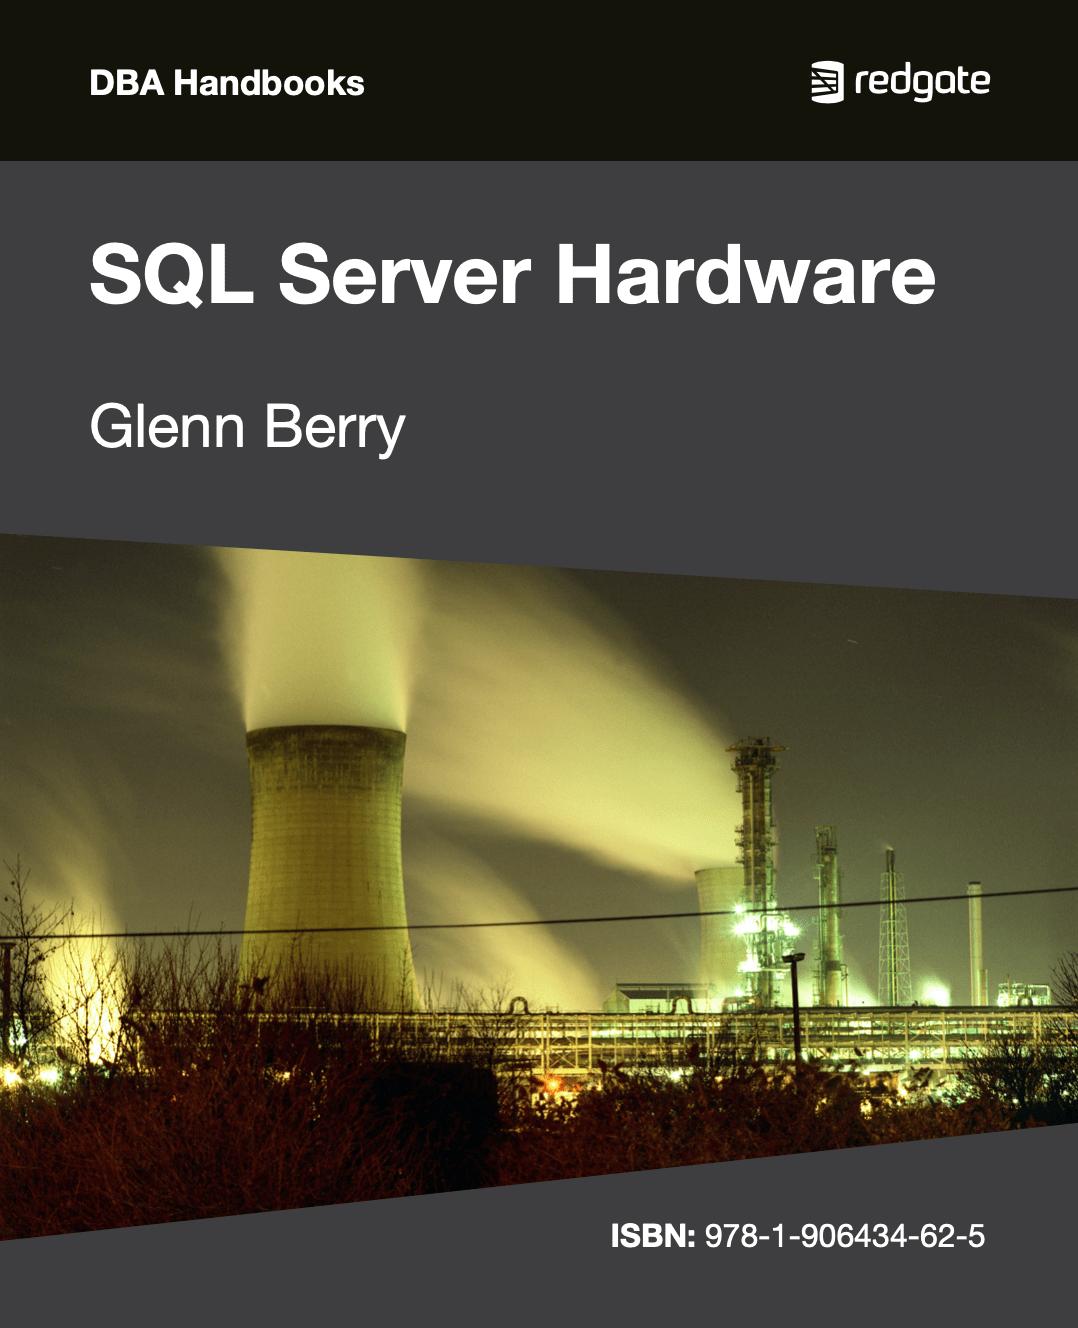 SQL Server Hardware eBook cover